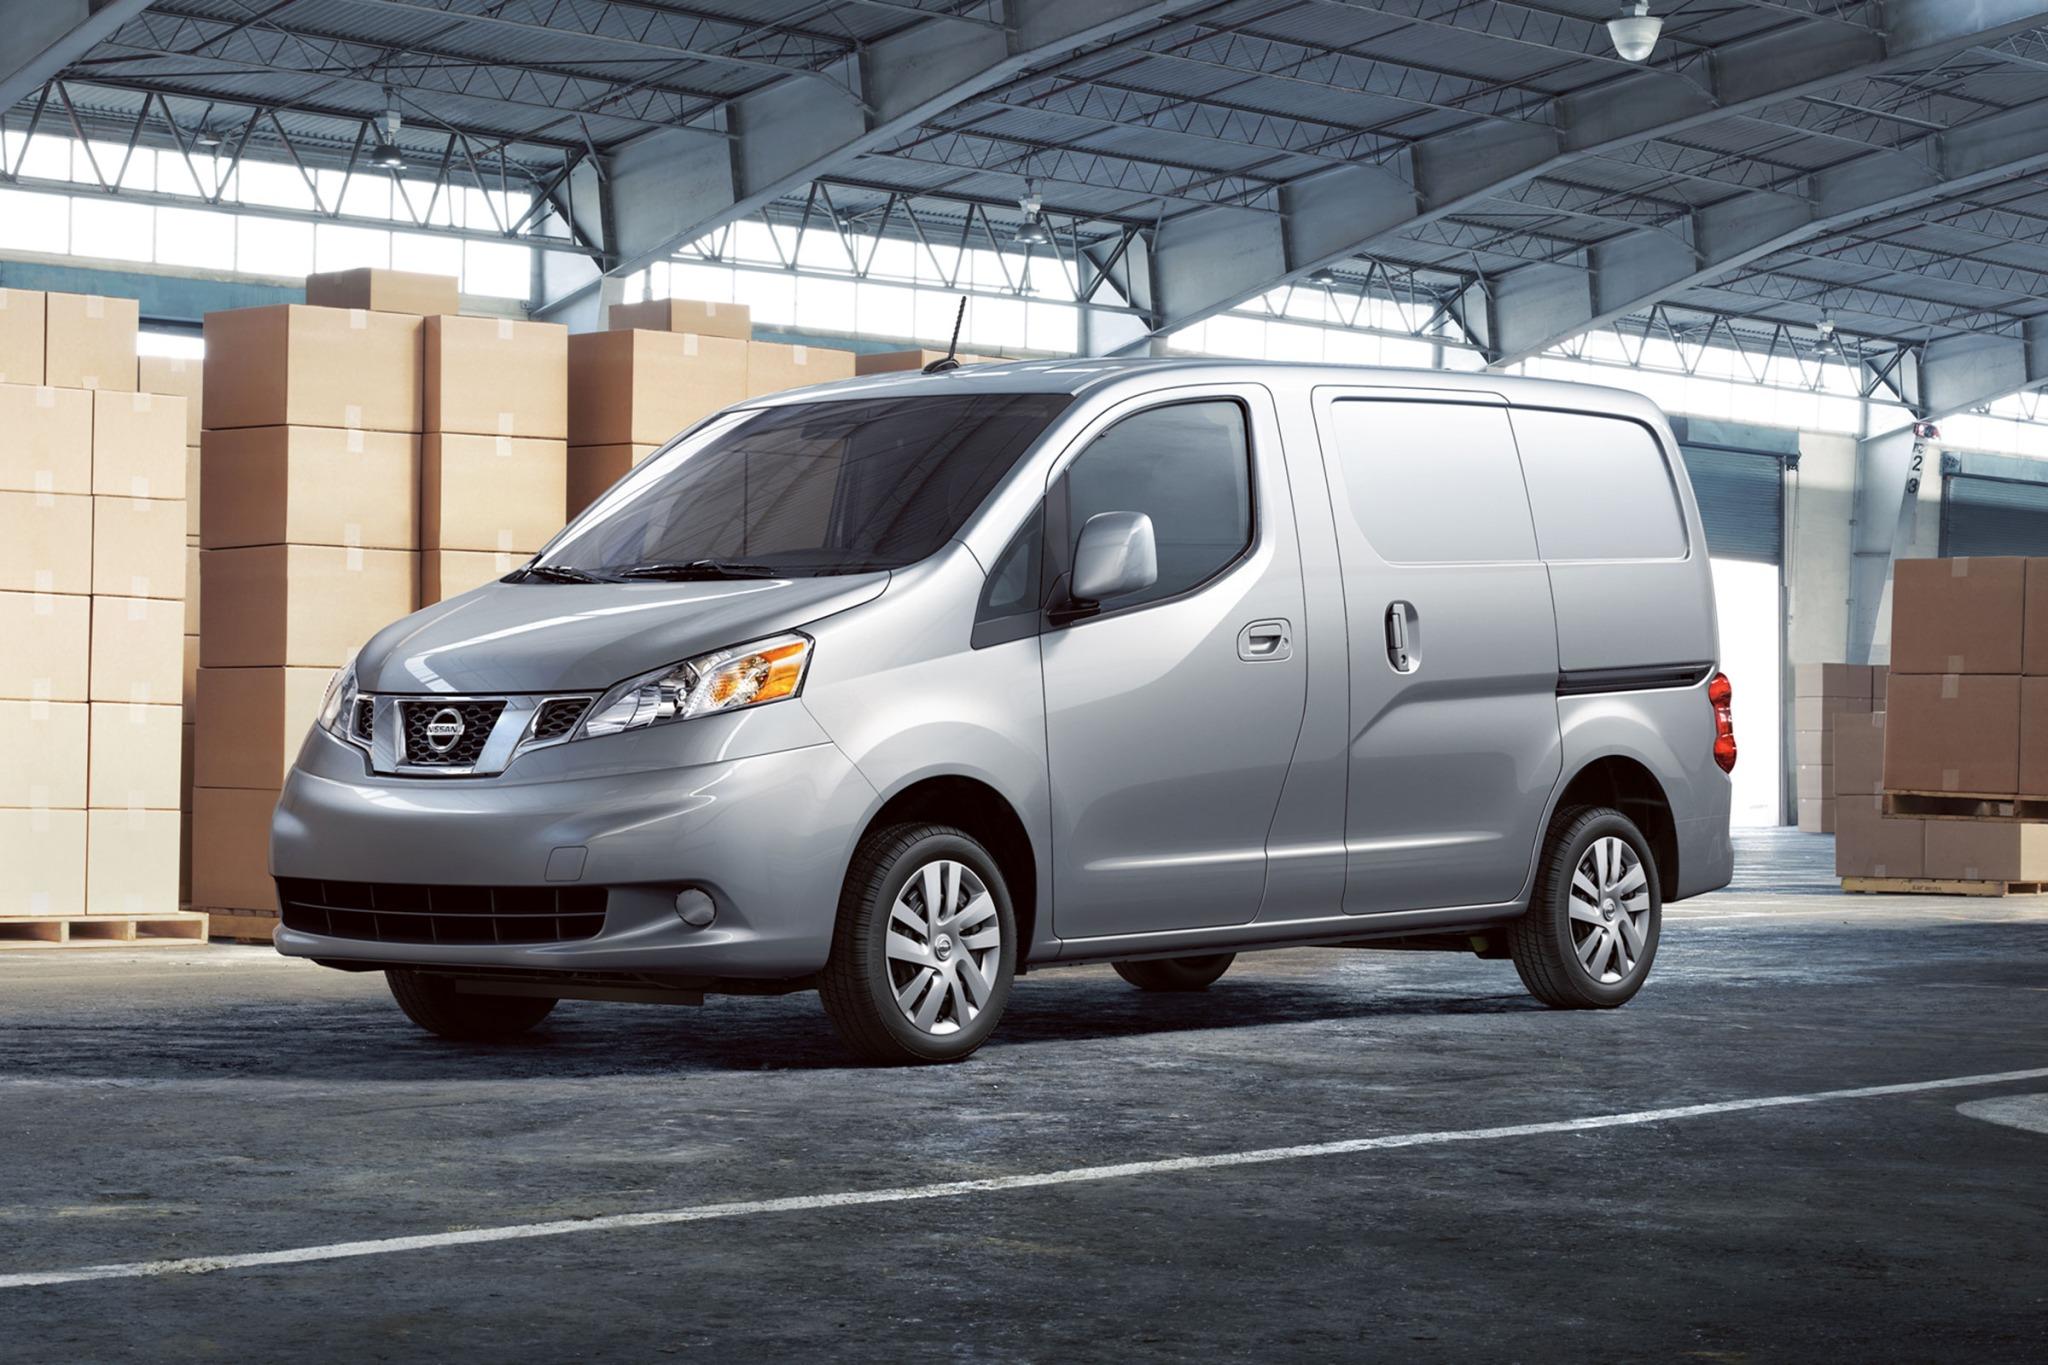 2017 nissan nv200 cargo minivan sv fq oem 1 2048